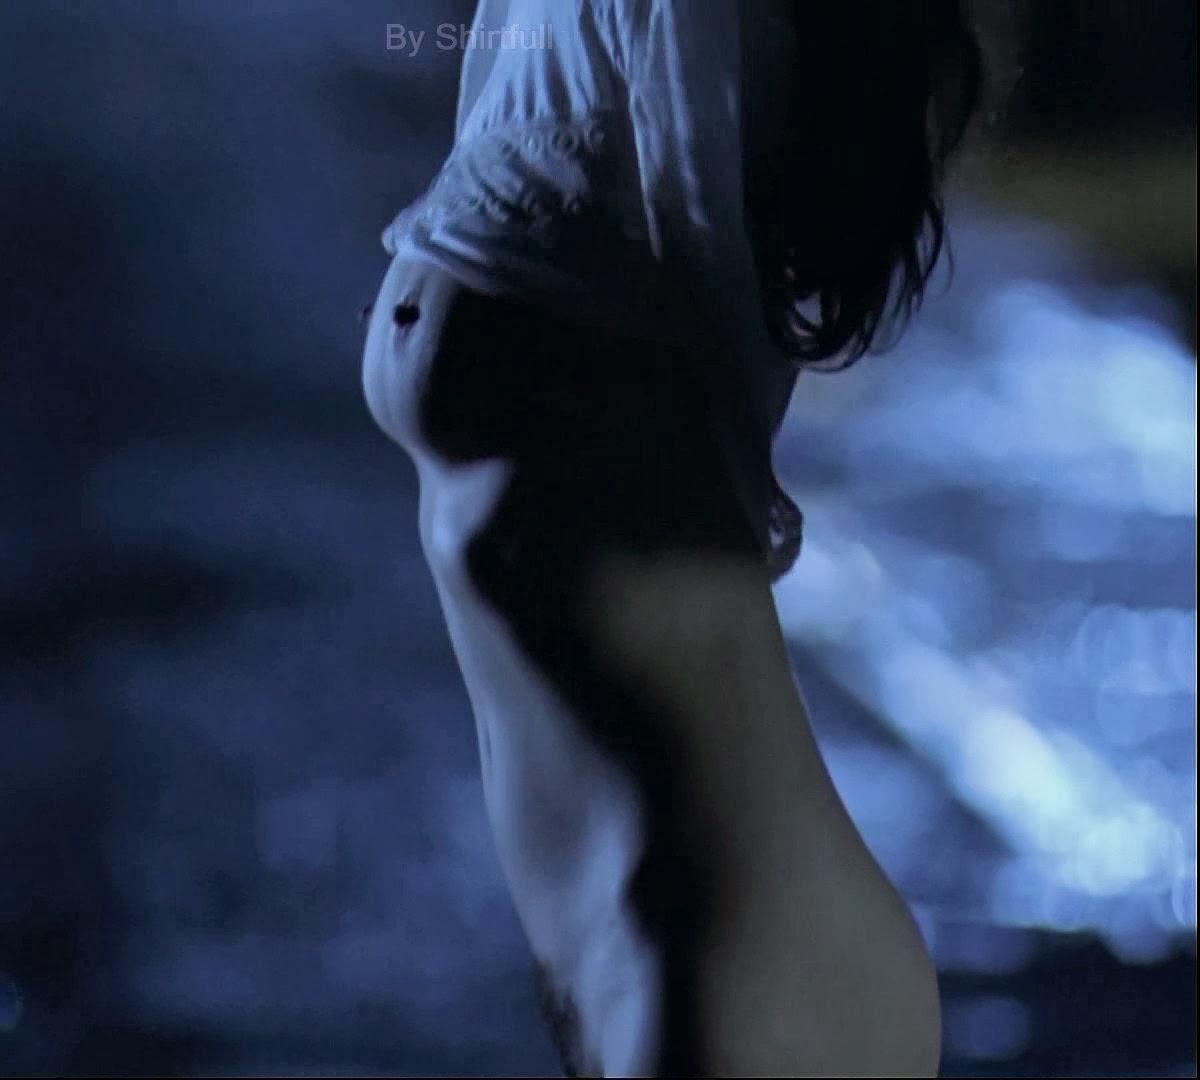 Natalie Portman naked pictures